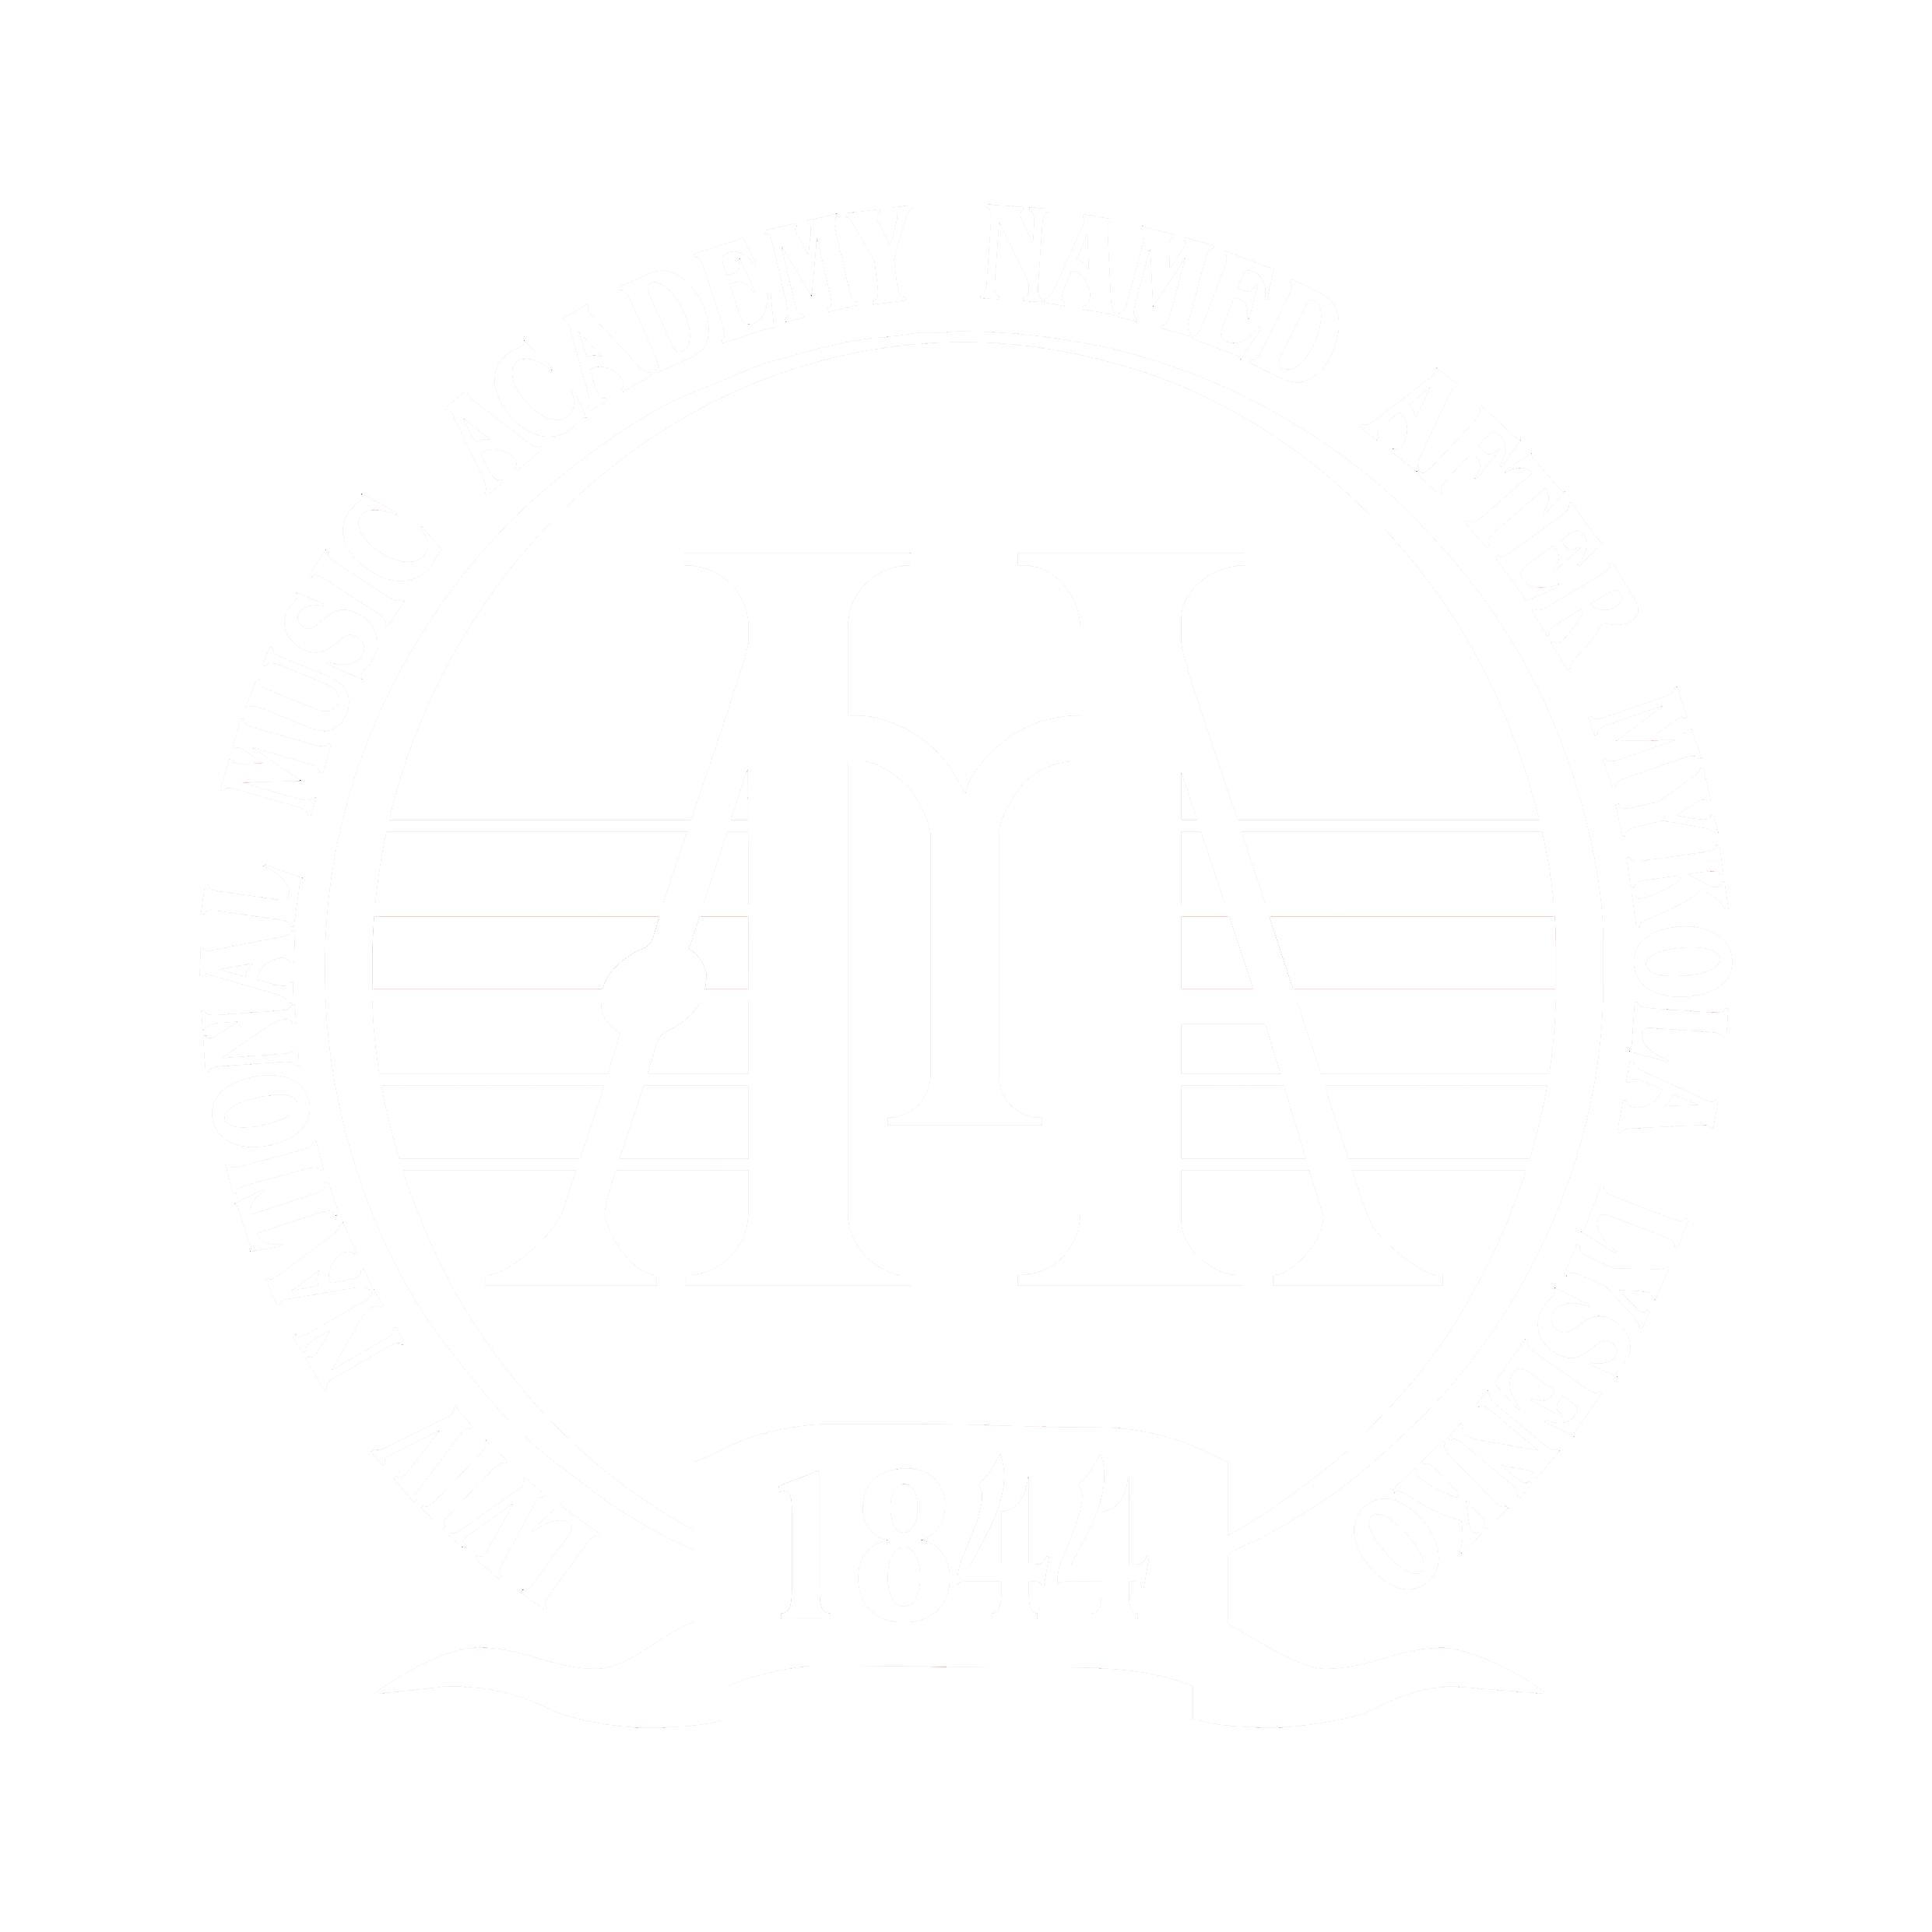 Львівська Національна Музична Академія імені М. В. Лисенка